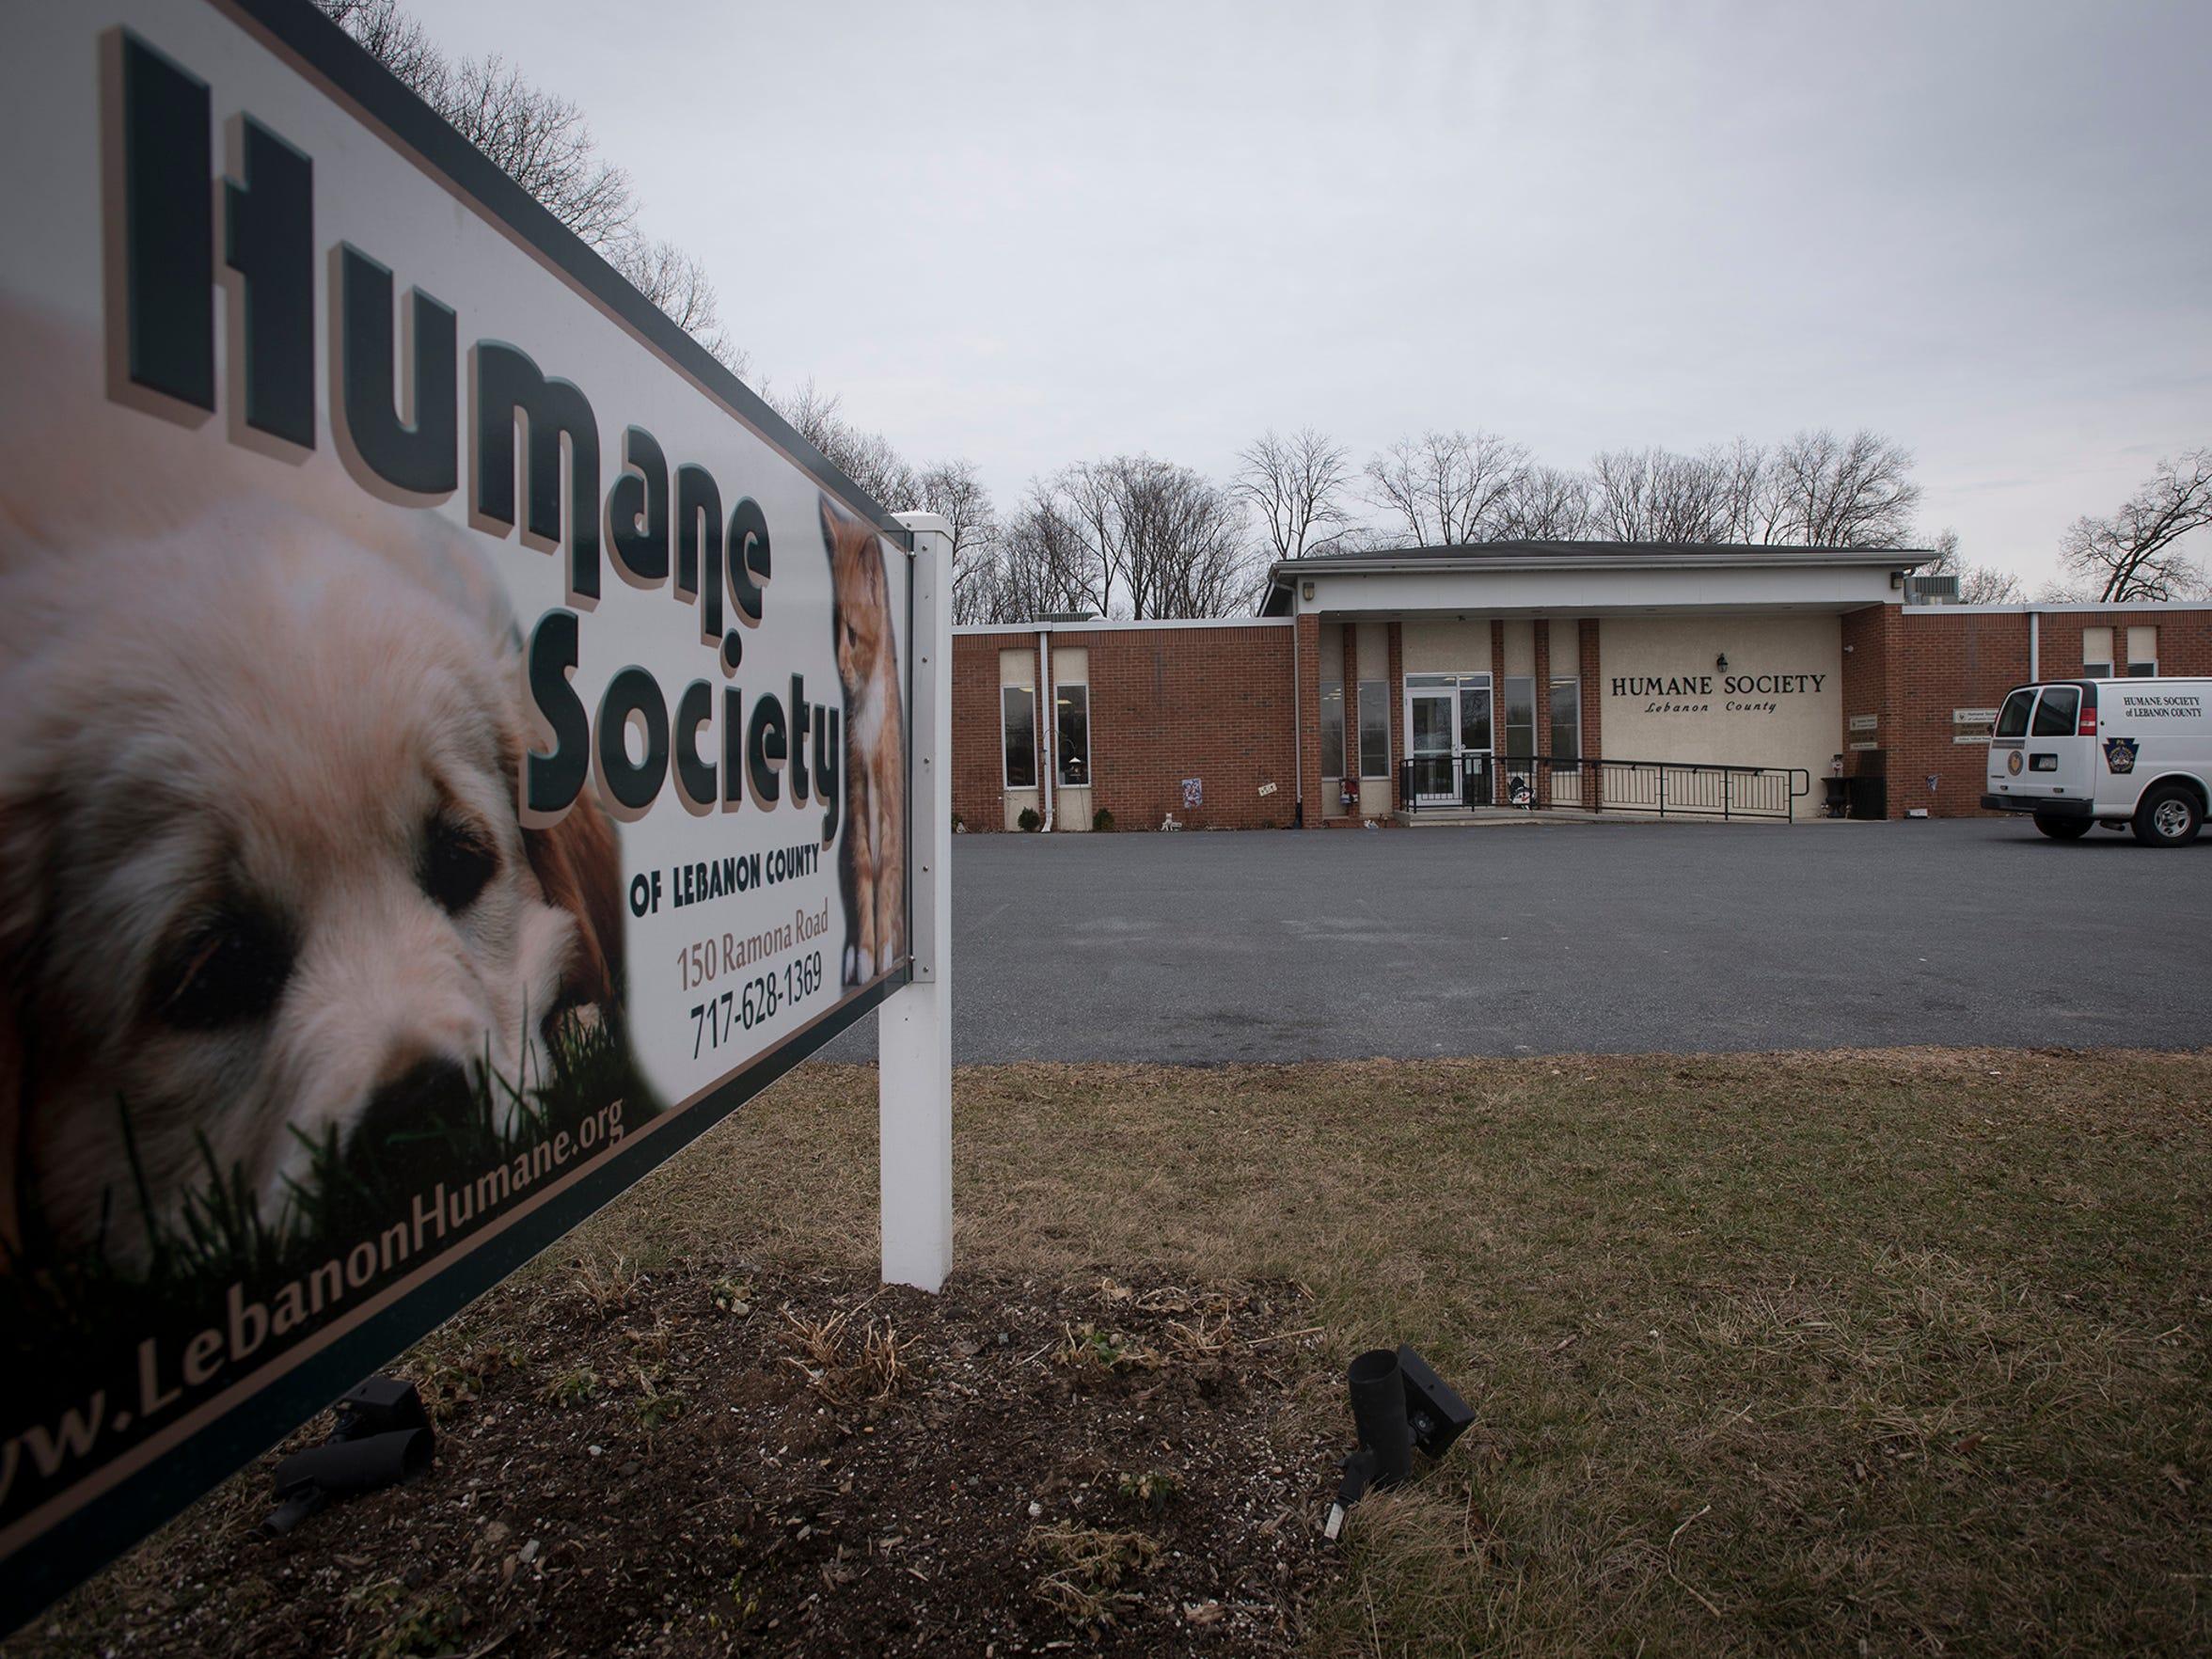 The Humane Society of Lebanon County.